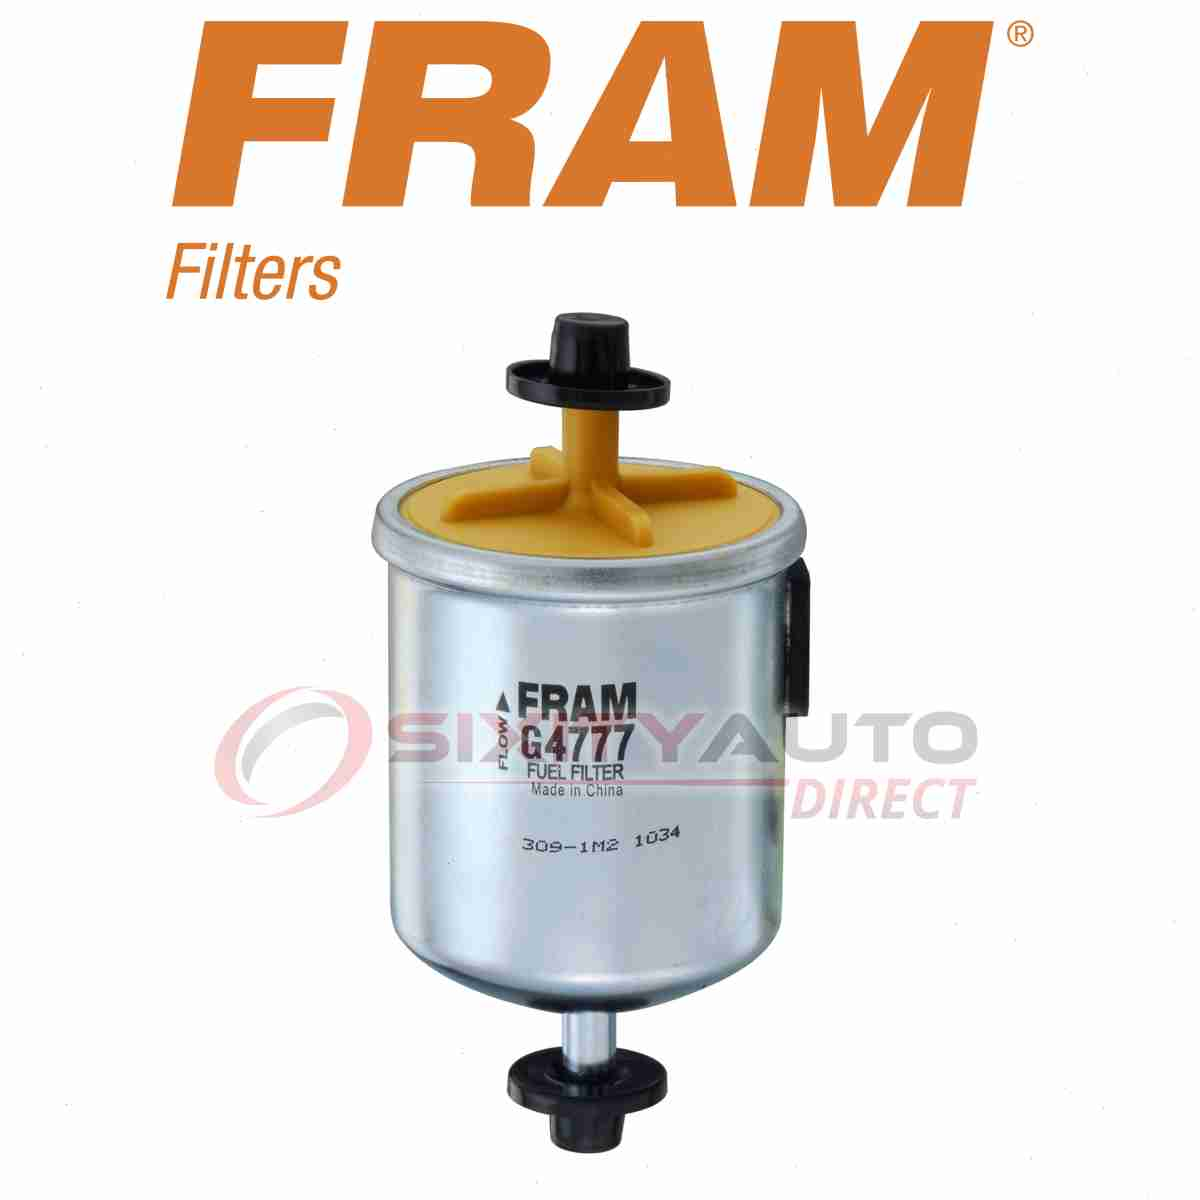 [SCHEMATICS_48IS]  FRAM Fuel Filter for 1997-2003 Infiniti QX4 - Gas Pump Line Air Delivery zs    eBay   Infiniti Qx4 Fuel Filter      eBay